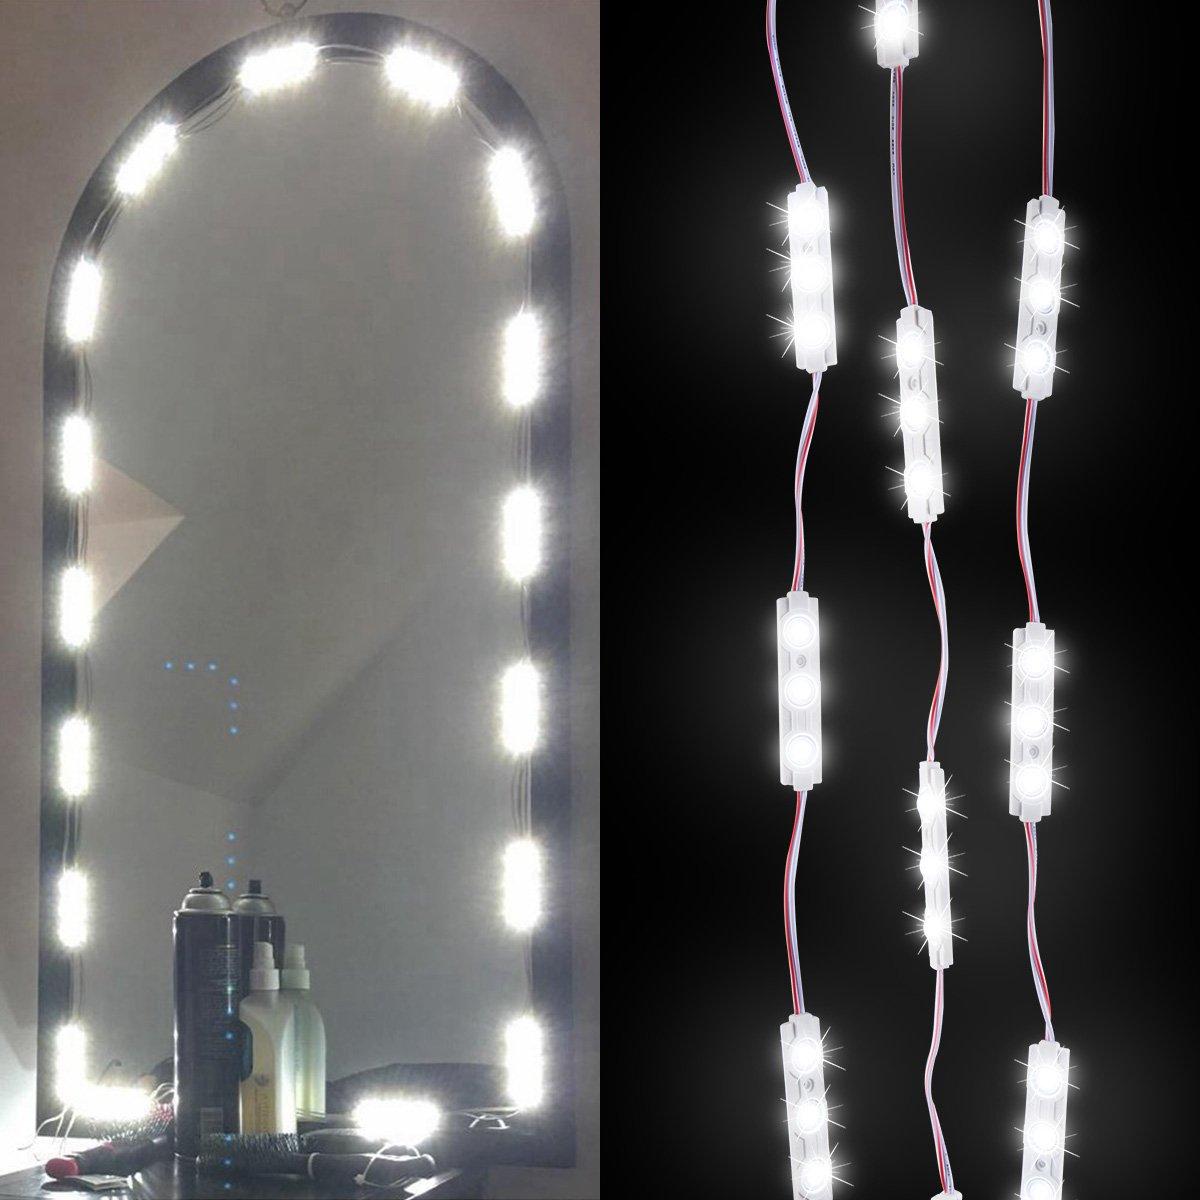 Kazoku make up vanity mirror led light 60 led bulbs 98 ft diy light kazoku make up vanity mirror led light 60 led bulbs 98 ft diy light kits cosmetic mirror with dimmer controller white mozeypictures Choice Image